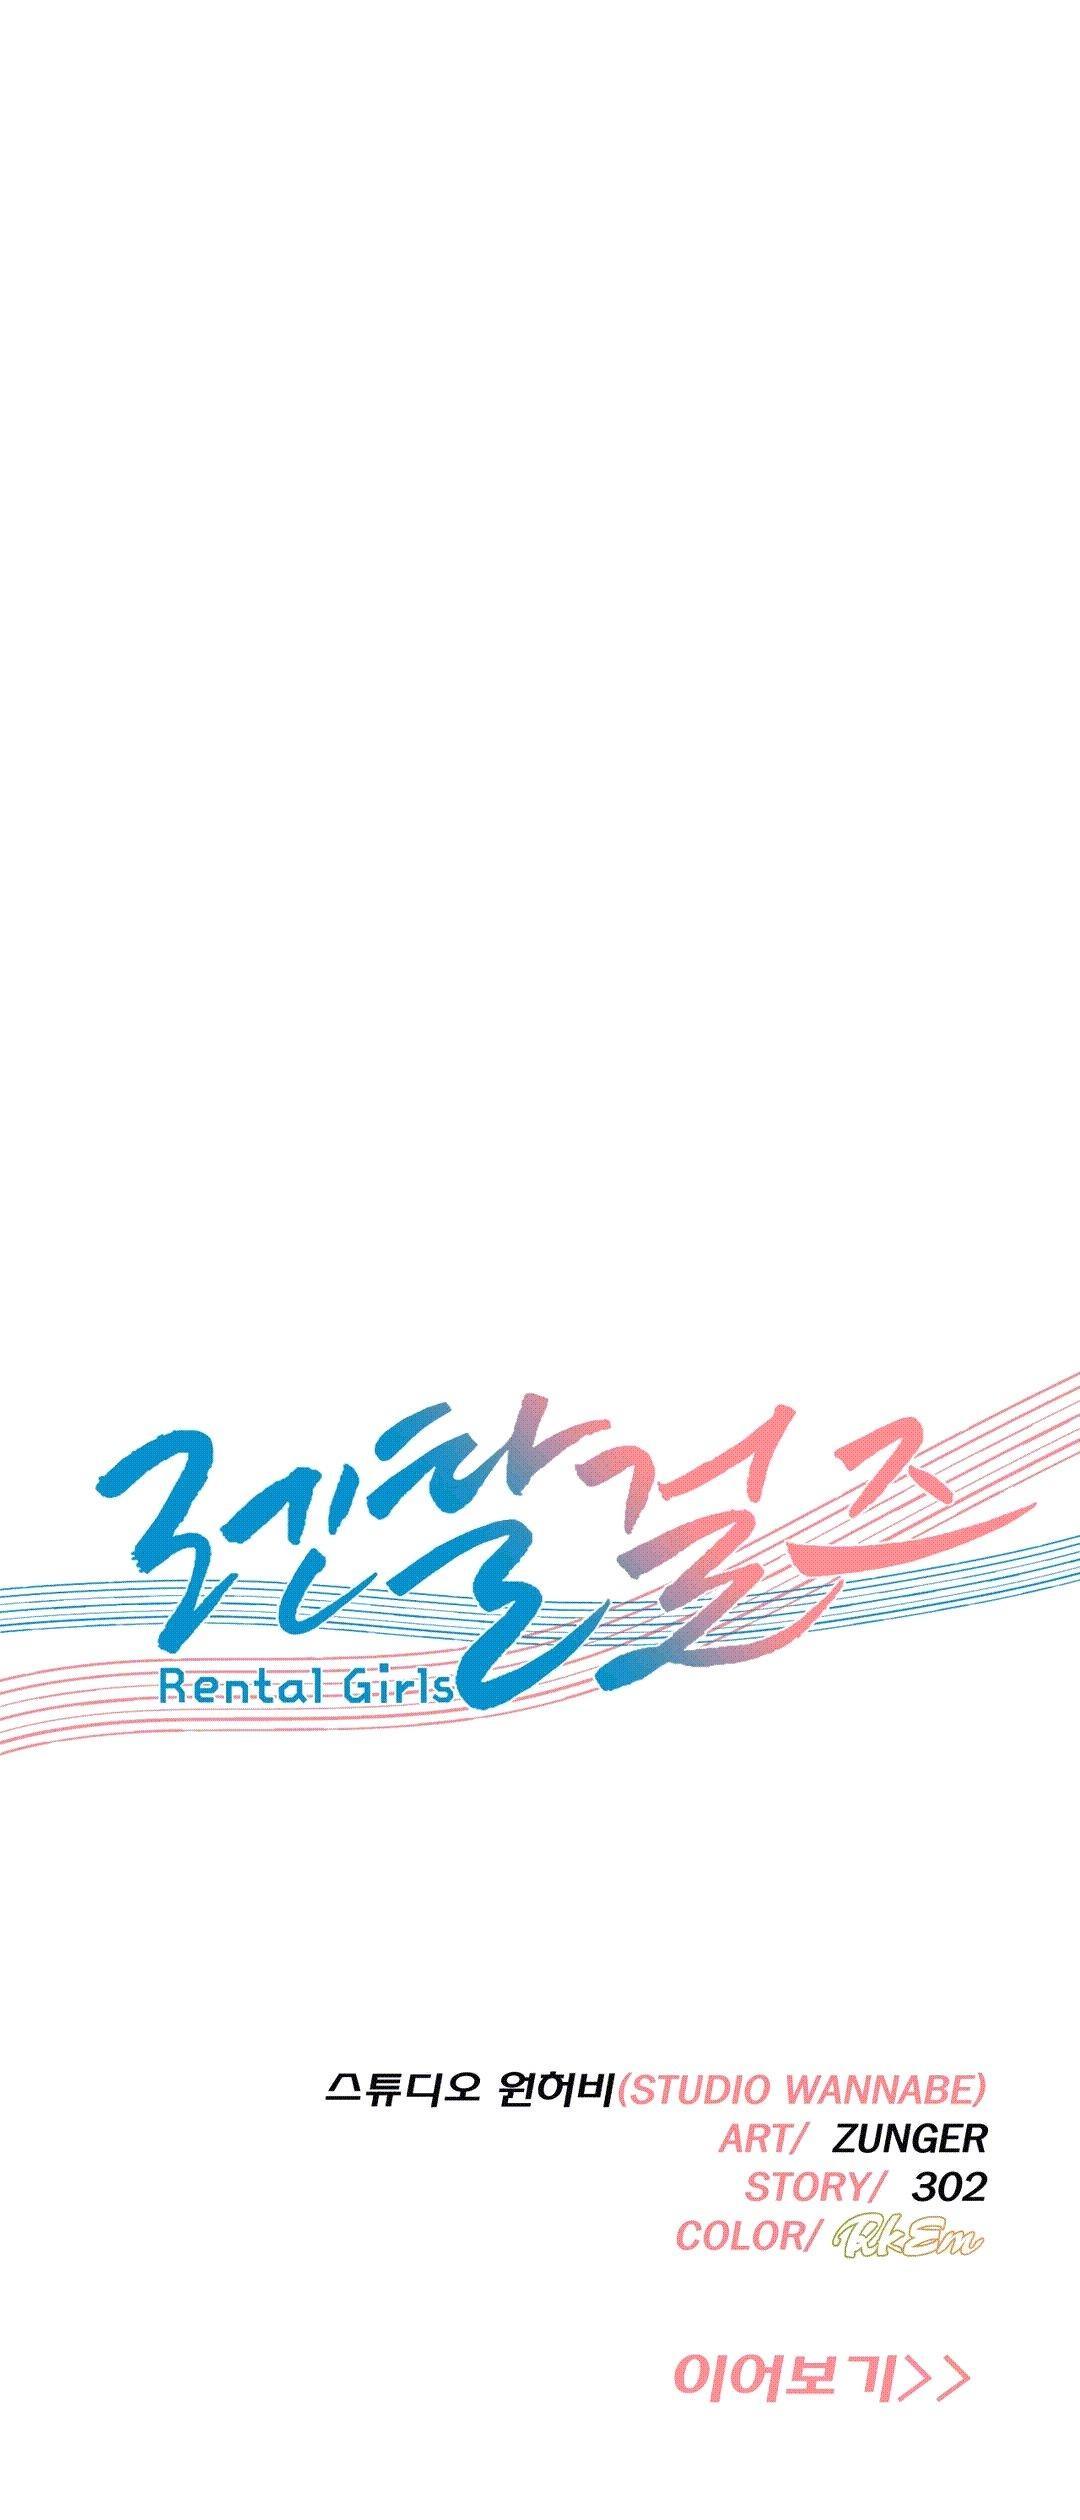 [Studio Wannabe] Rental Girls | 出租女郎 Ch. 33-58 [Chinese]  第二季 完结 634